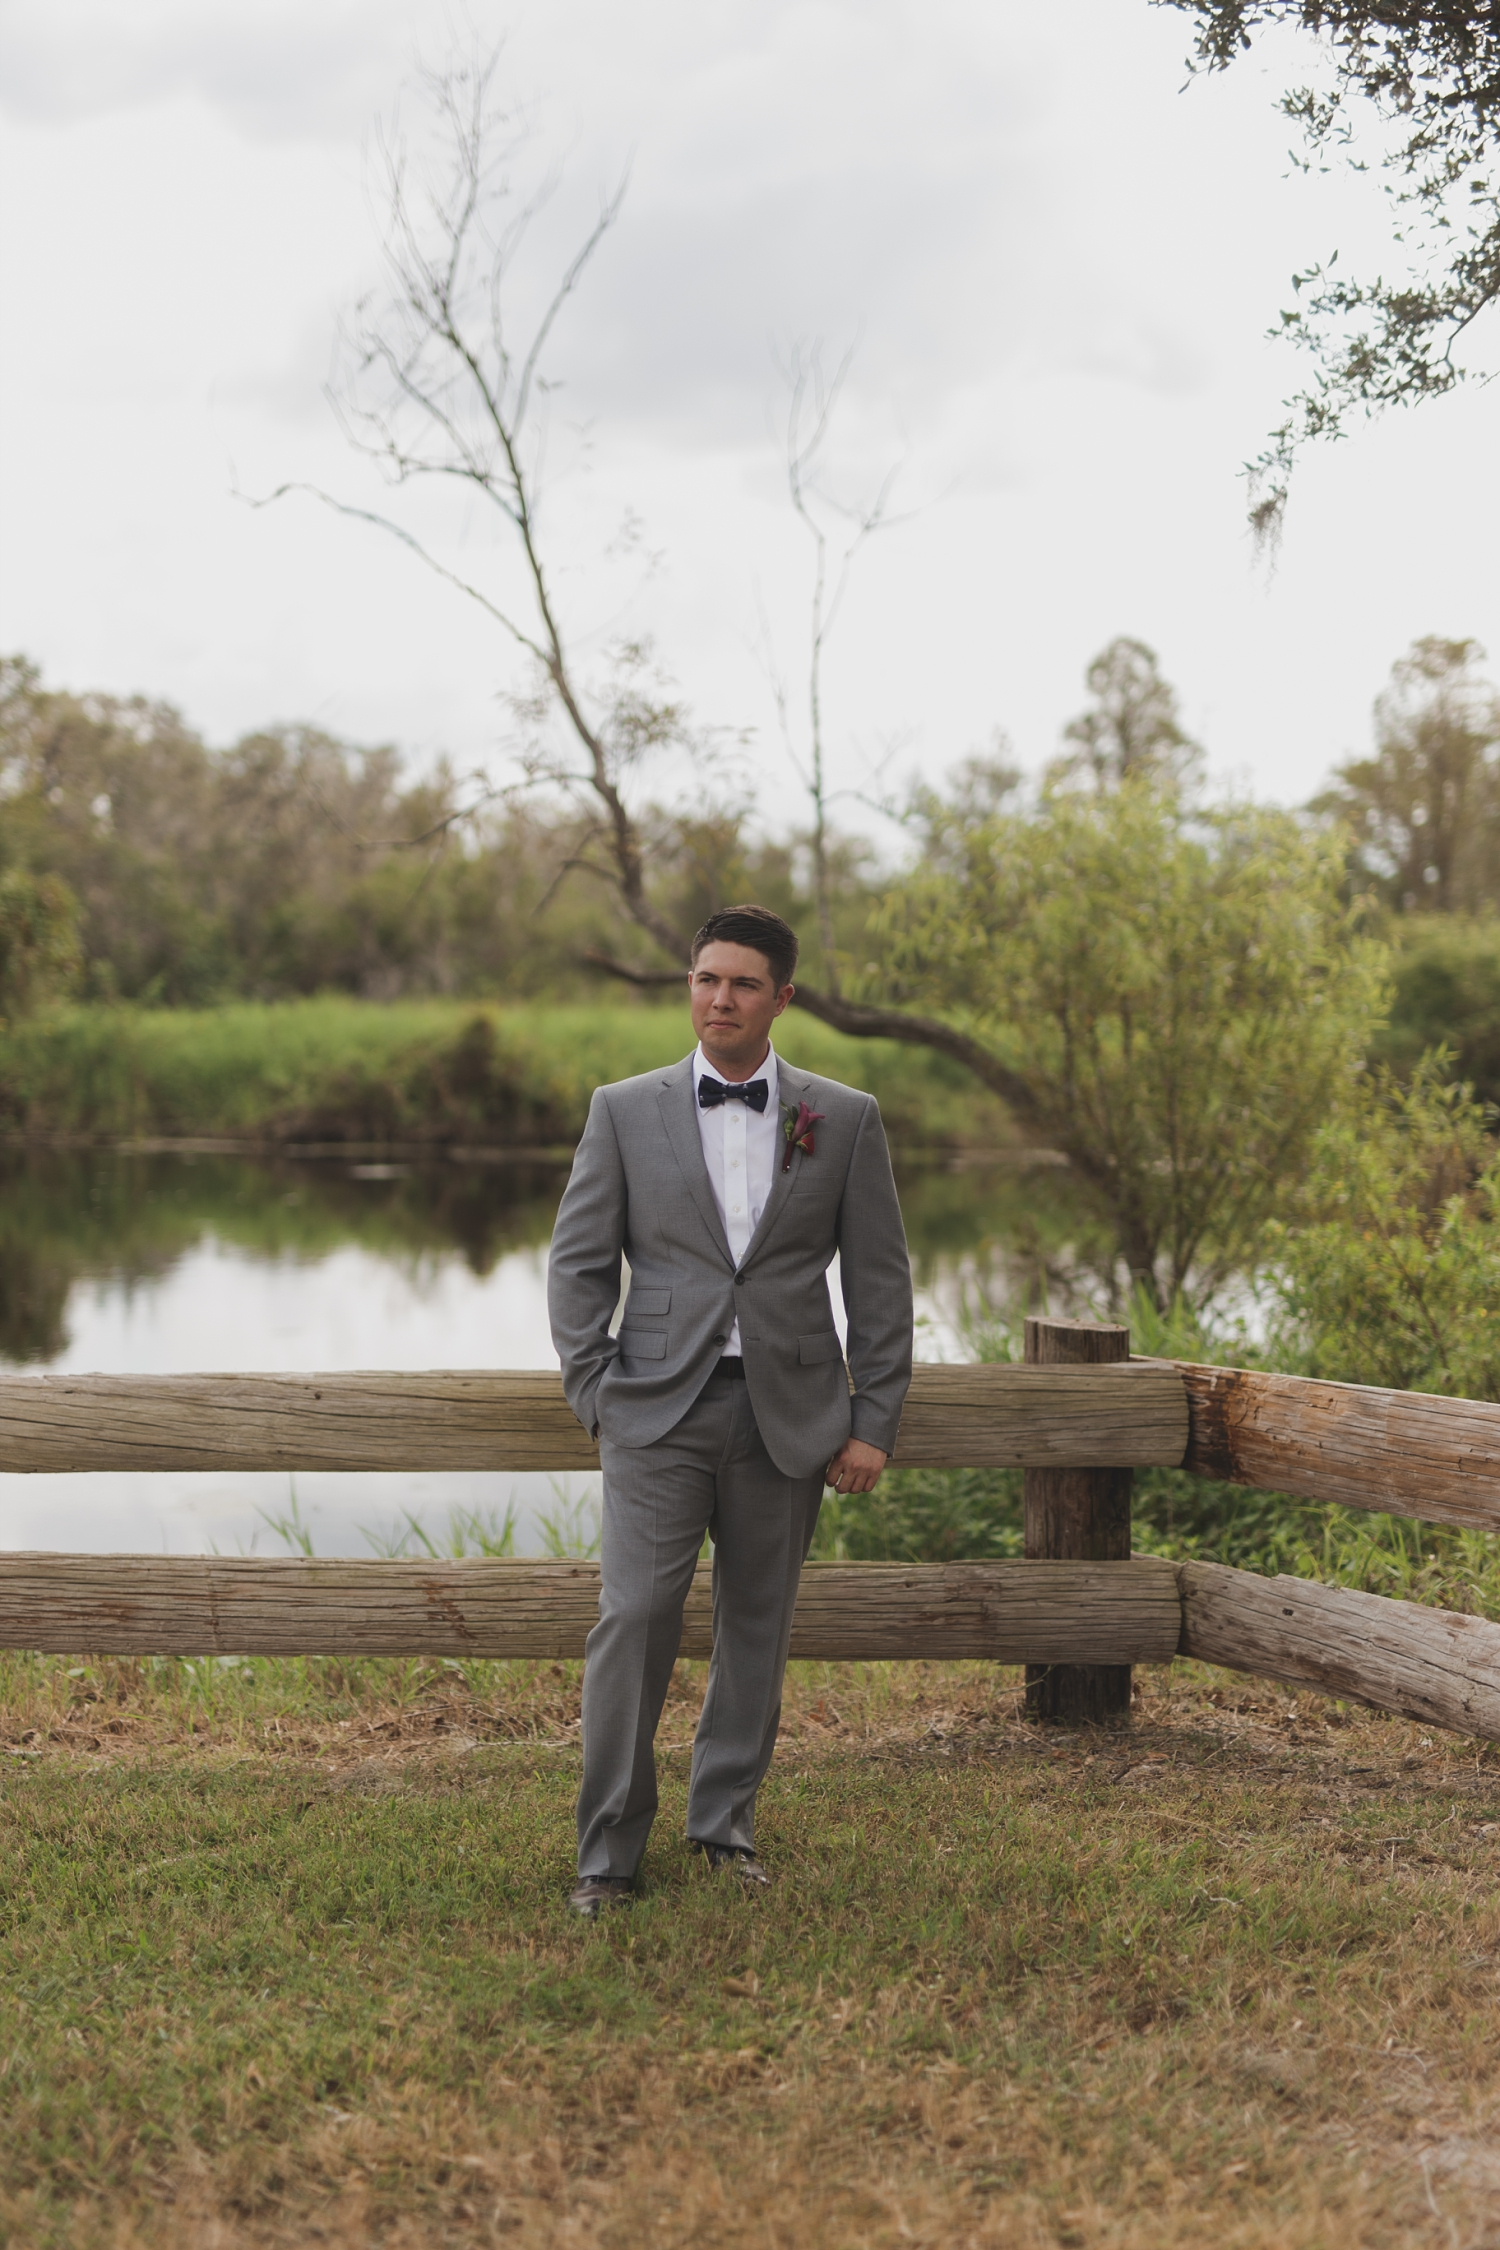 Stacy Paul Photography - destination wedding photographer Florida boho wedding_0032.jpg